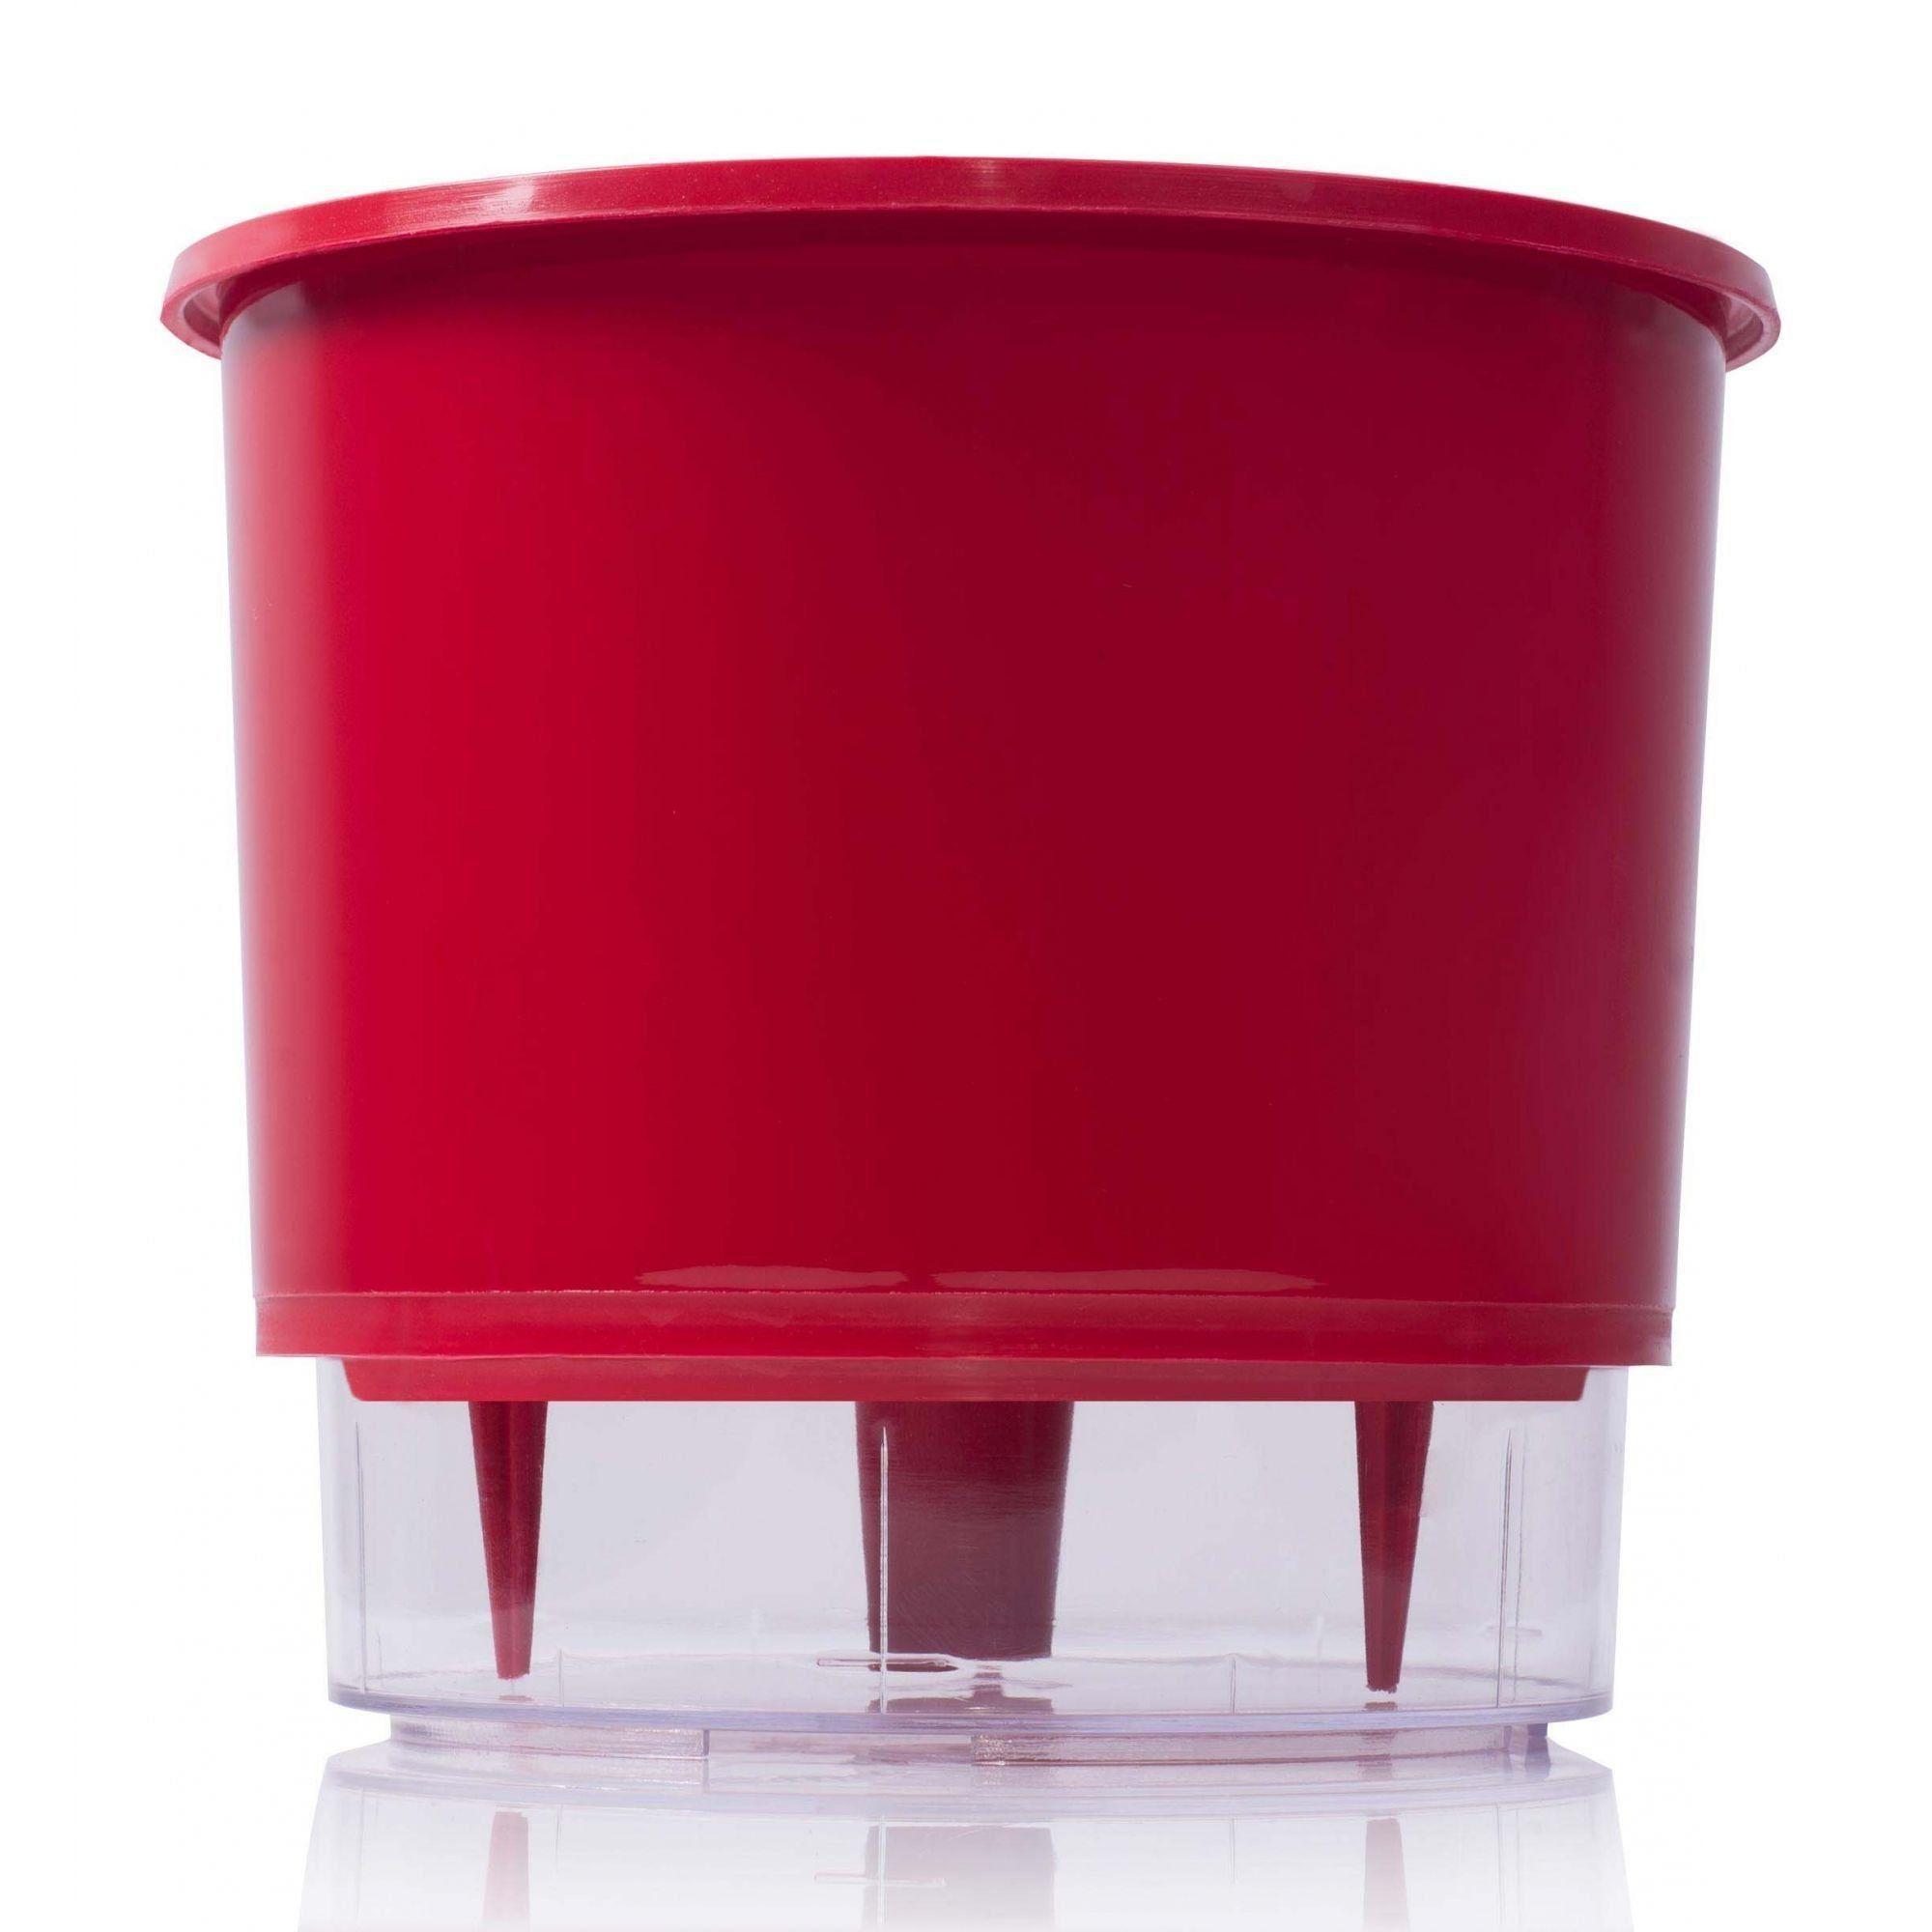 Vaso Autoirrigável Médio 16cm x 14cm Vermelho